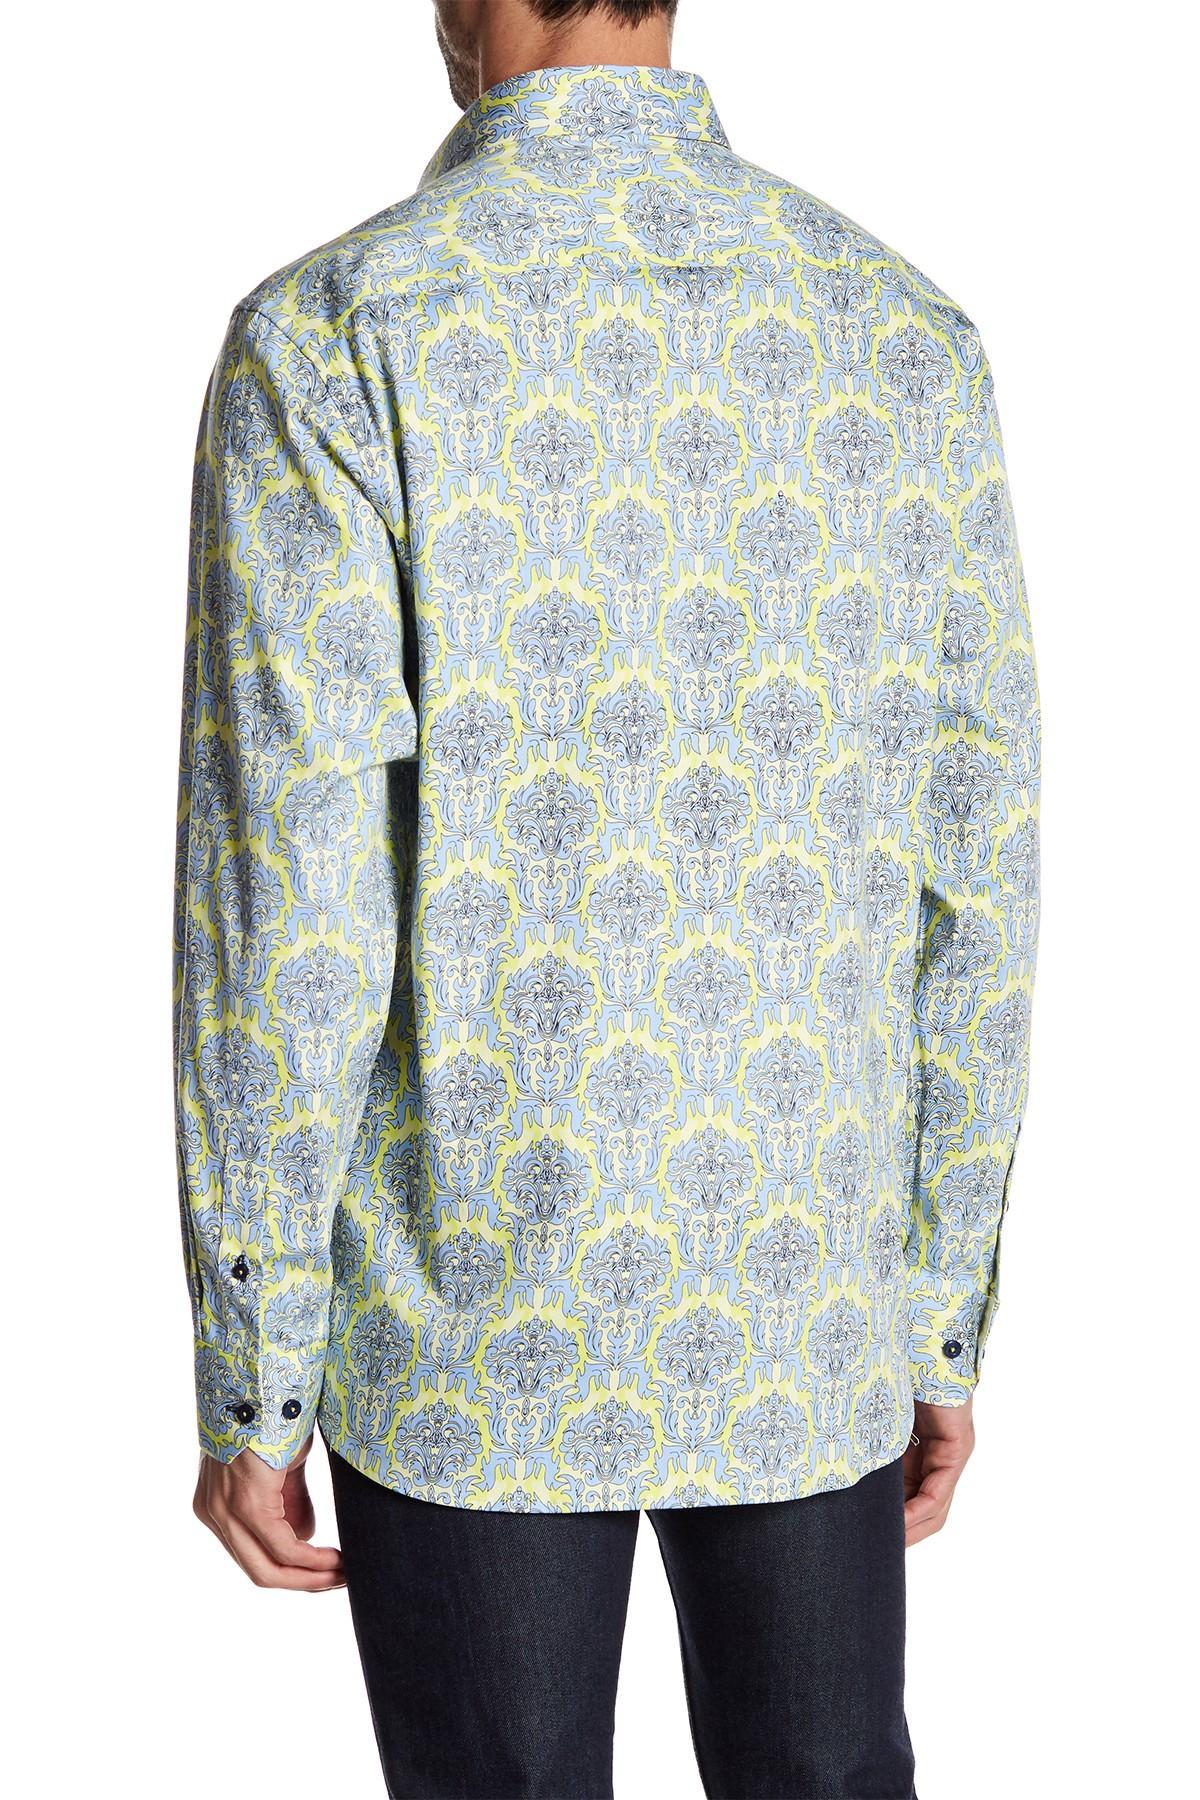 Lyst coogi printed regular fit dress shirt in blue for men for Regular fit dress shirt